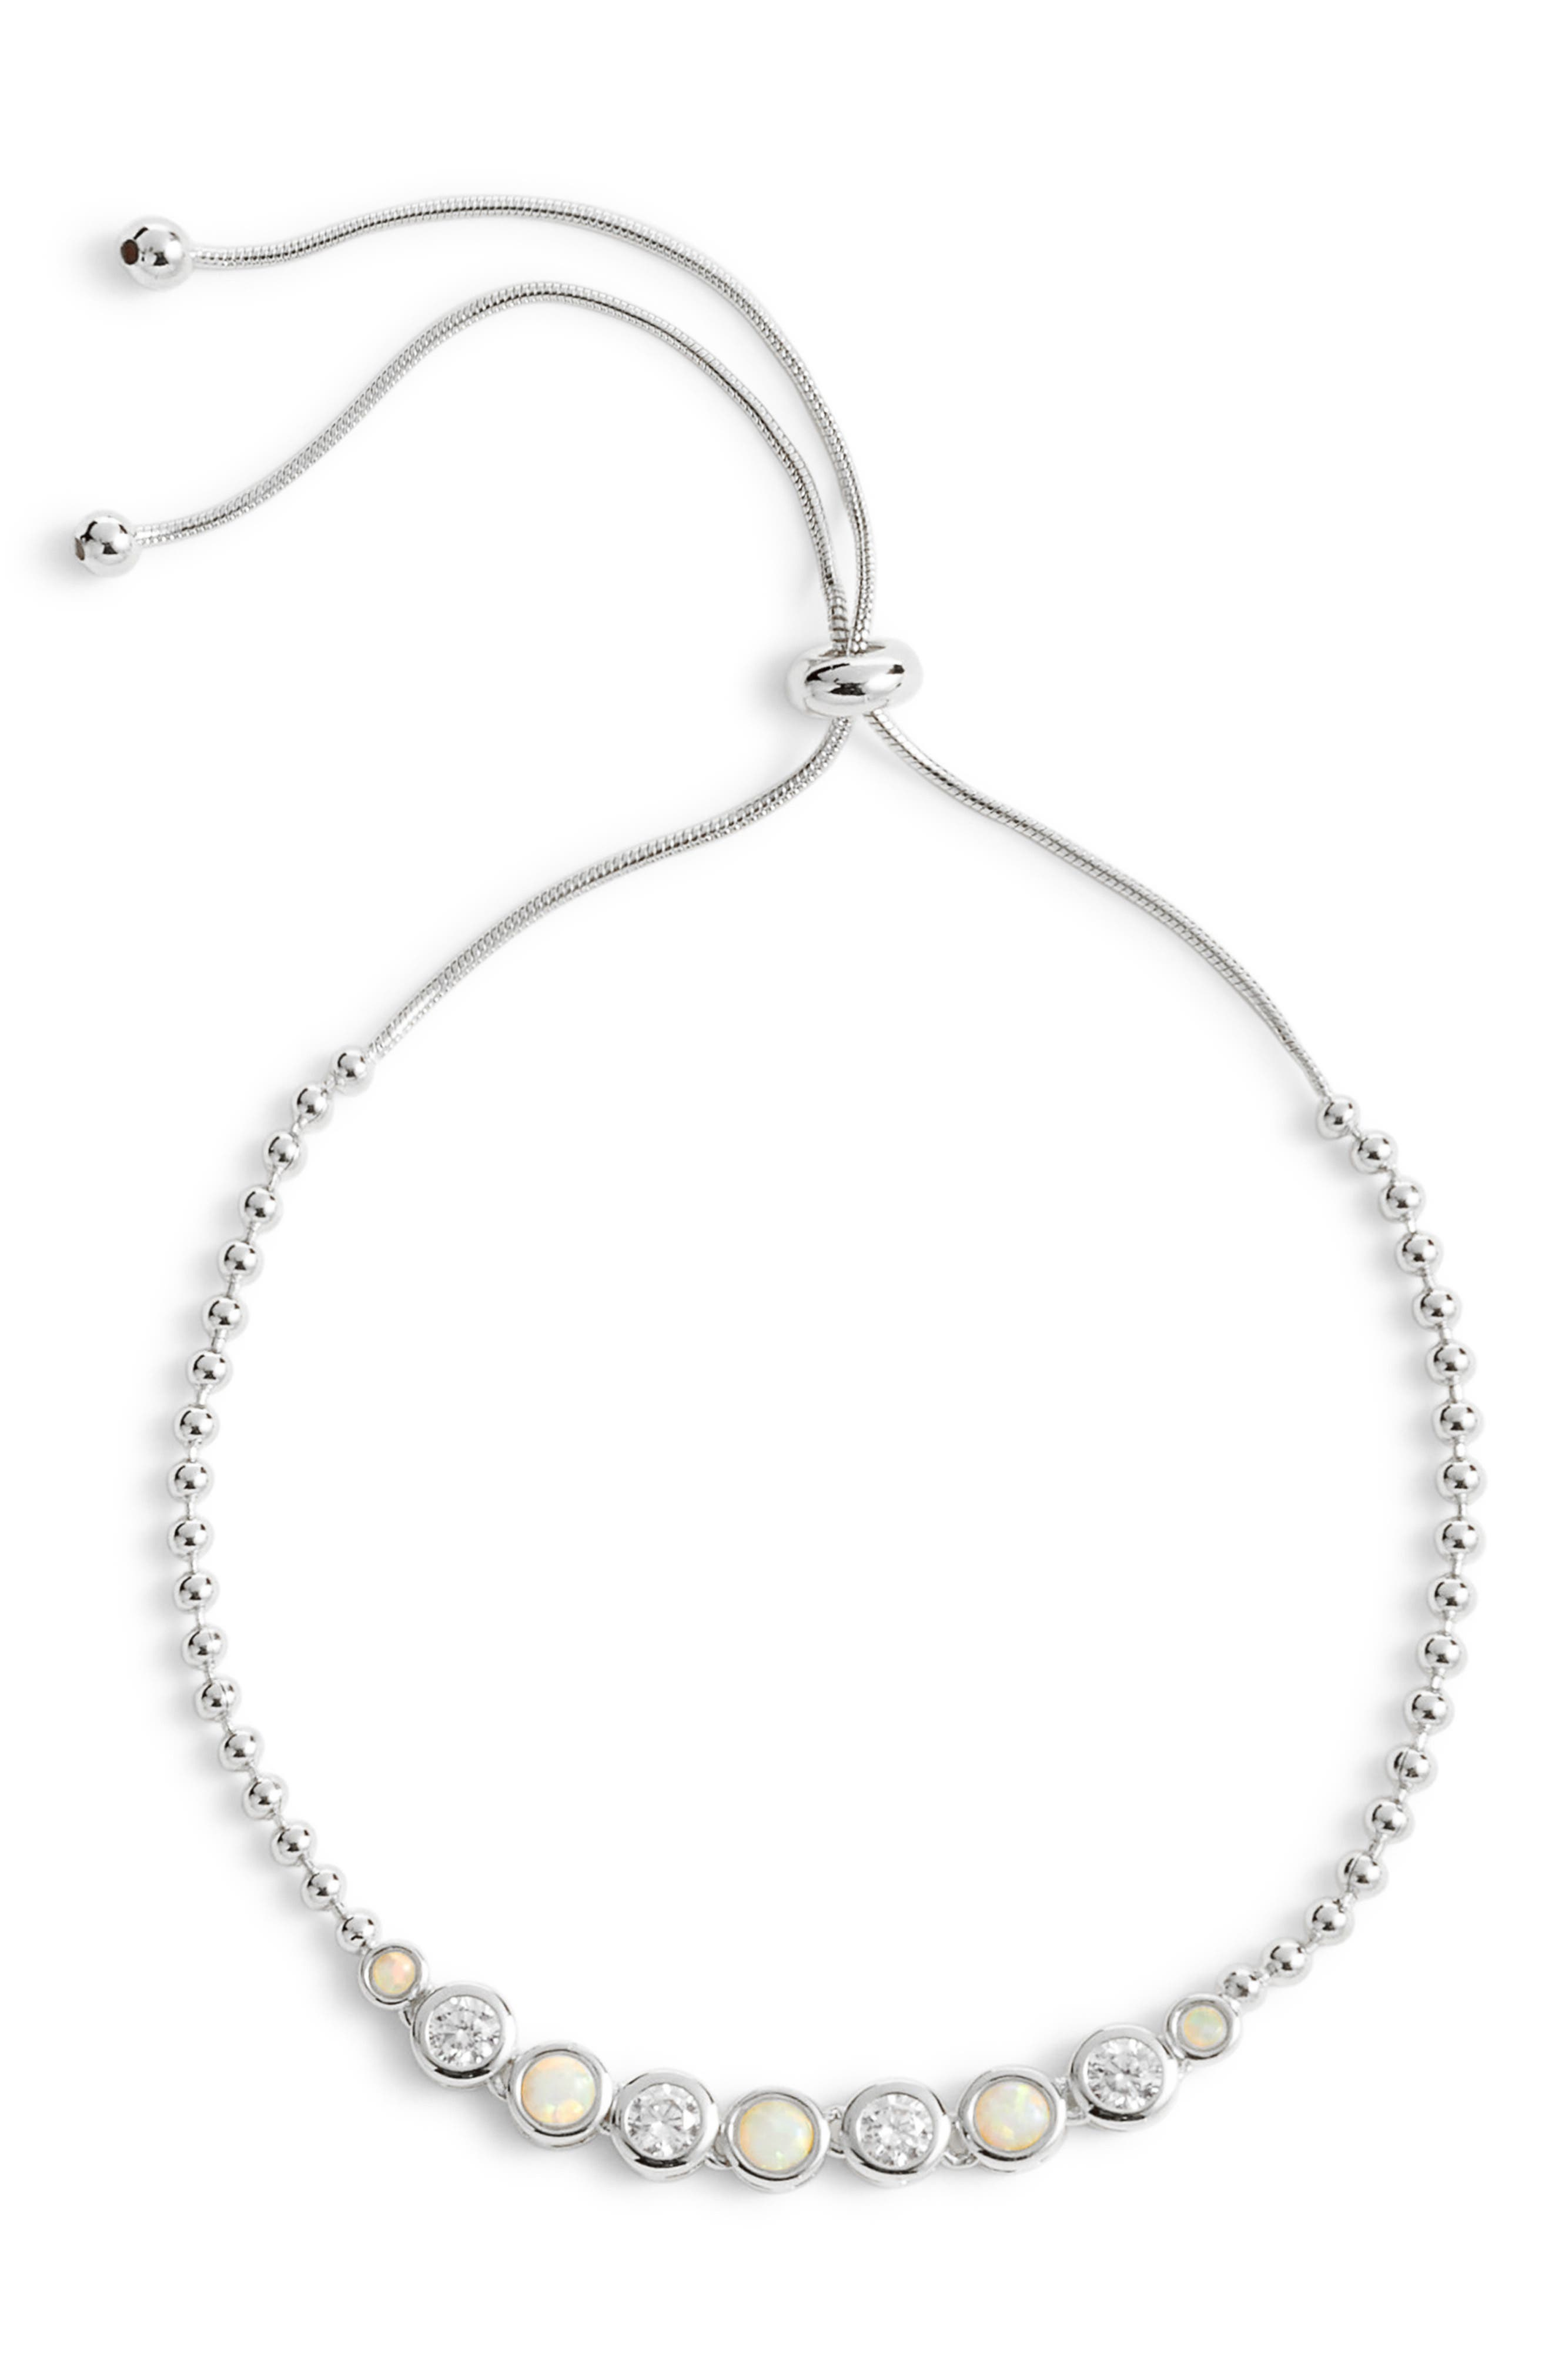 Opal Adjustable Bracelet,                         Main,                         color, OPAL/ SILVER